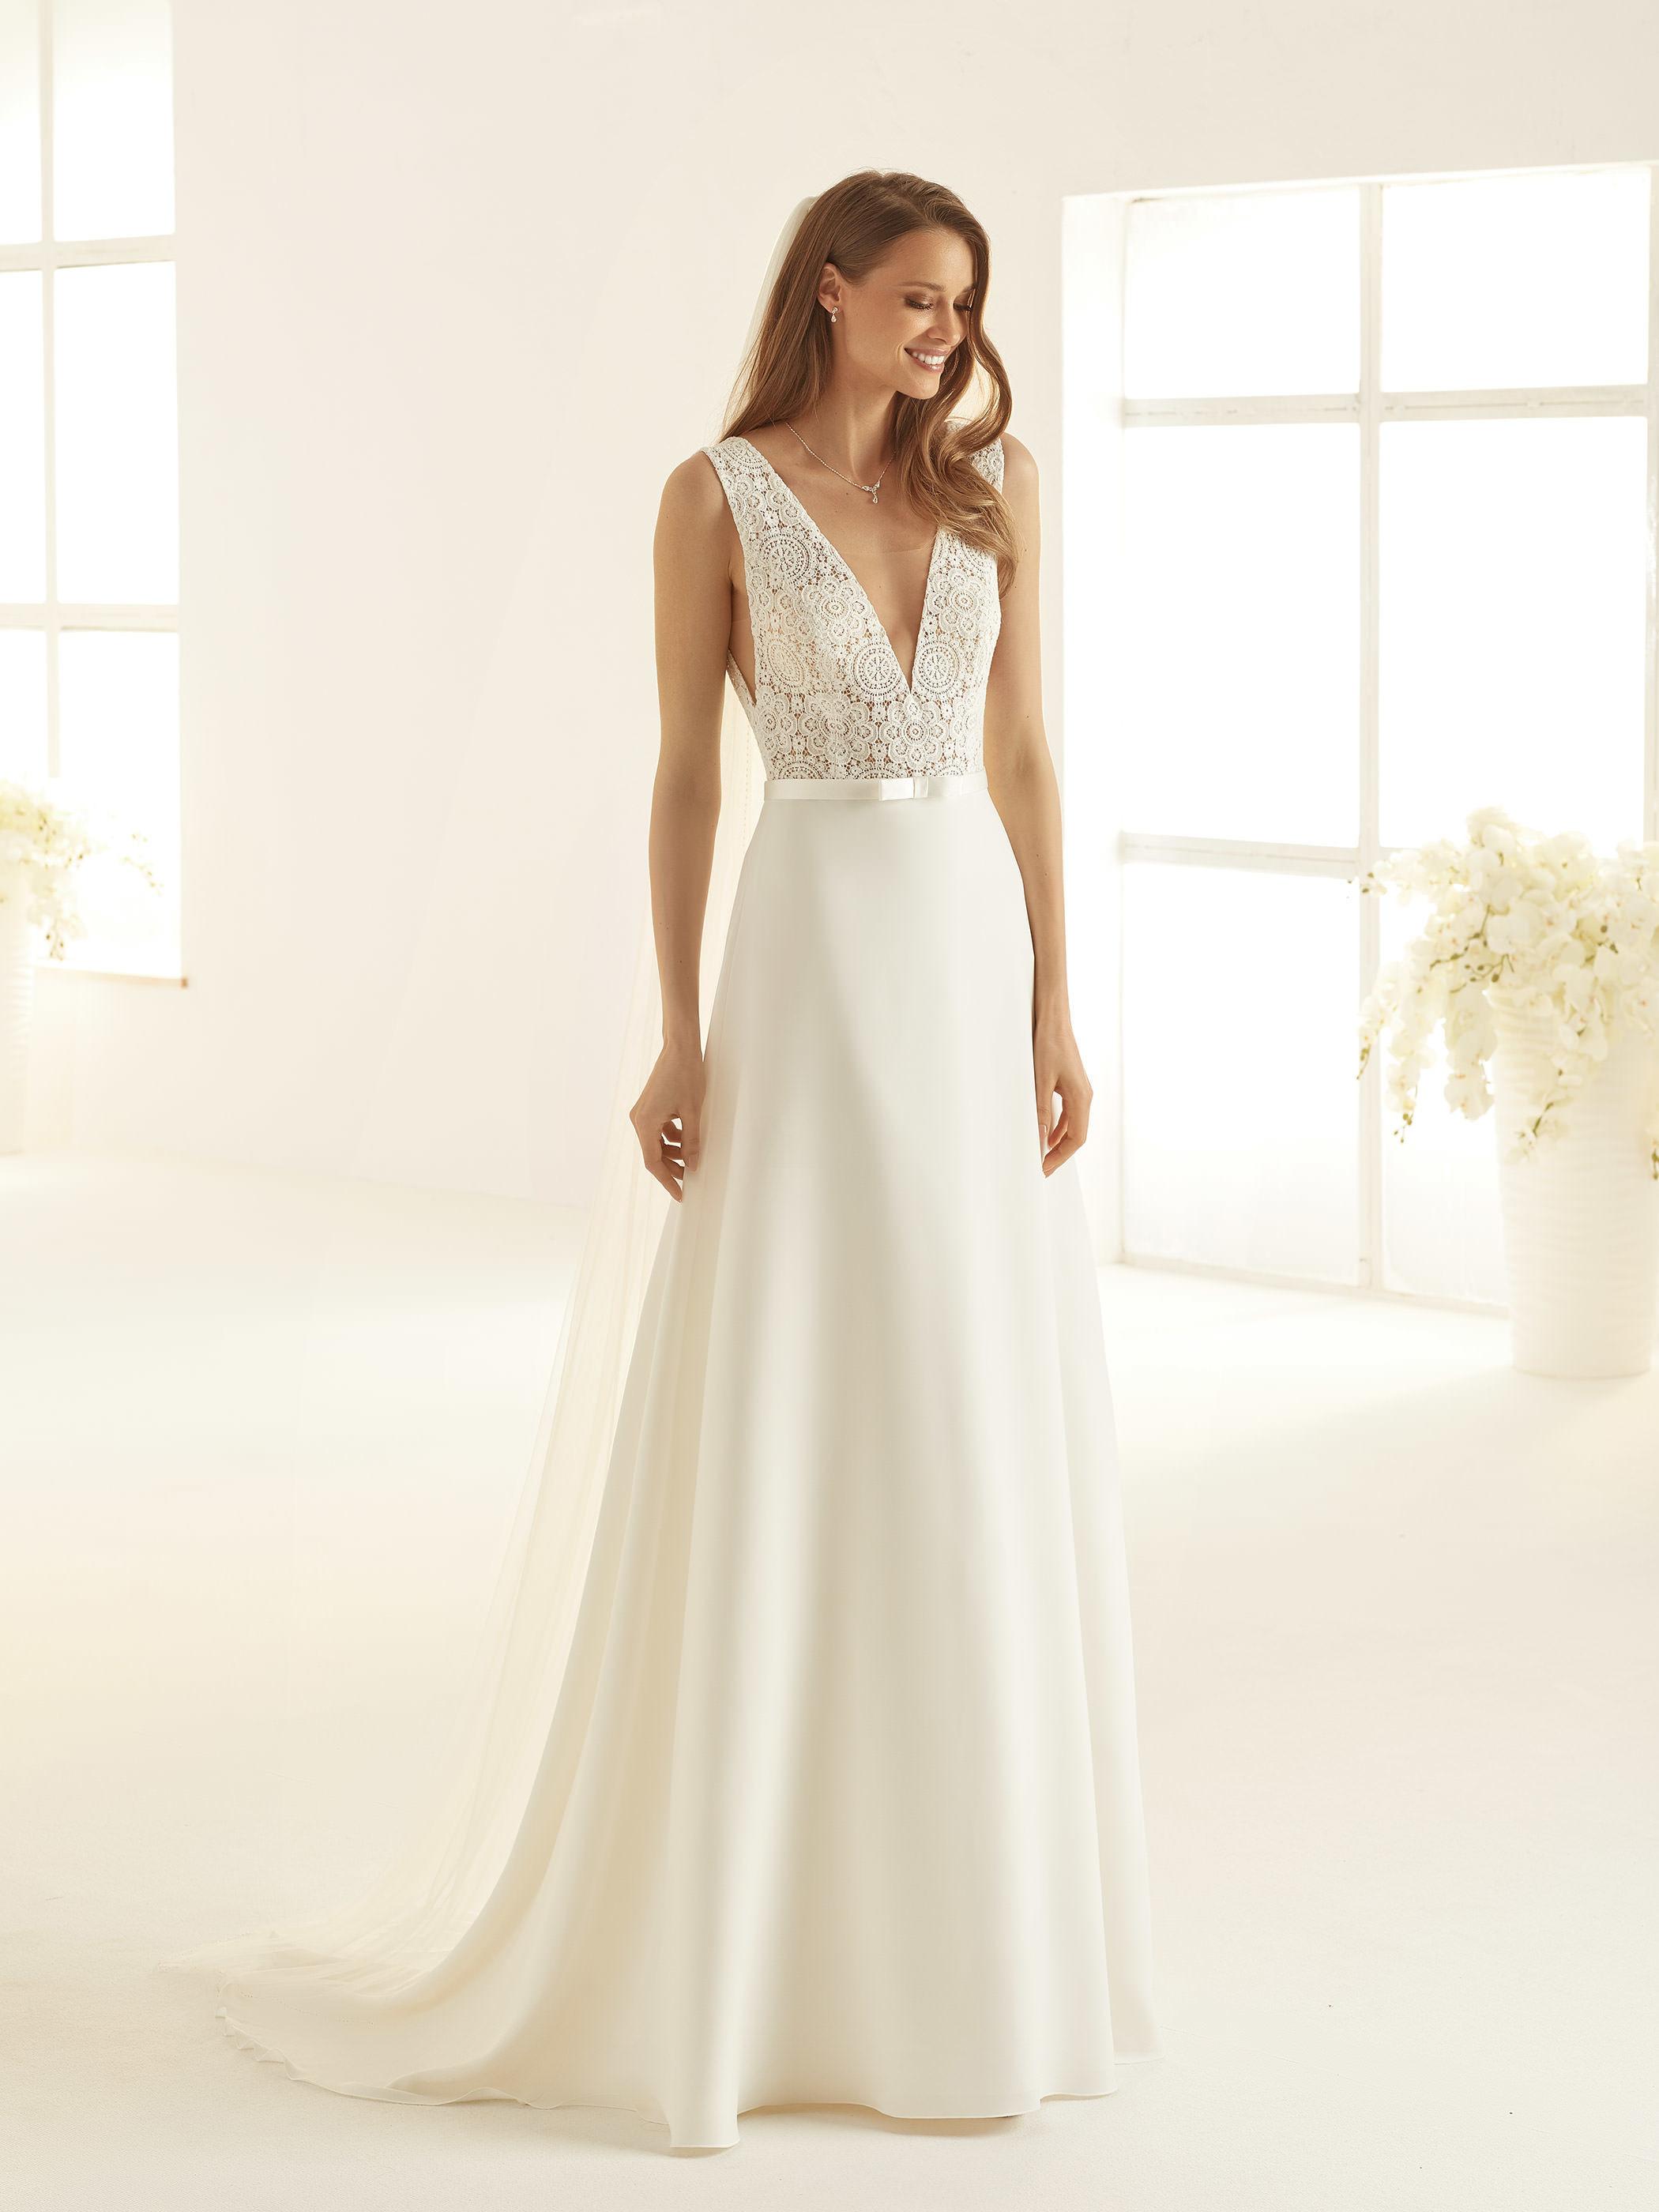 Hochzeitskleid Dallas | Samyra Fashion